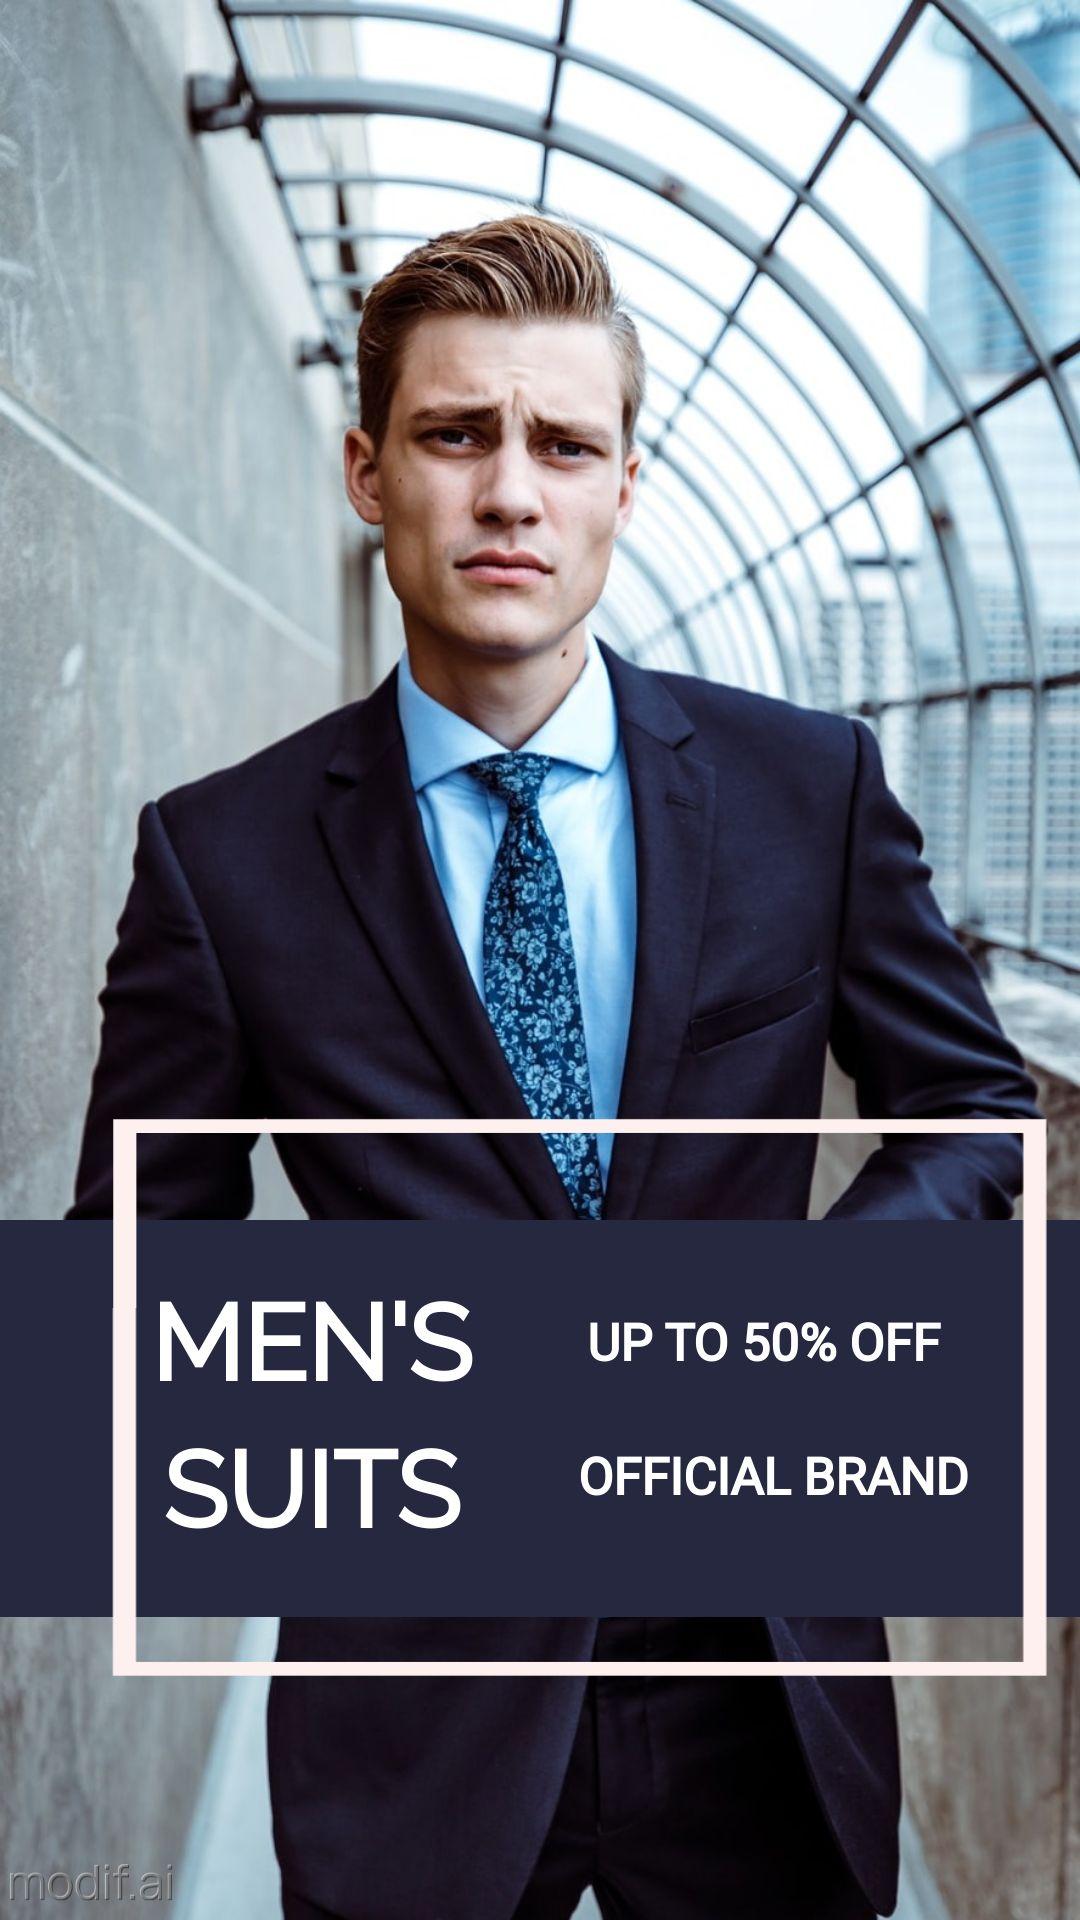 Mens Fashion Suit Instagram Story Maker